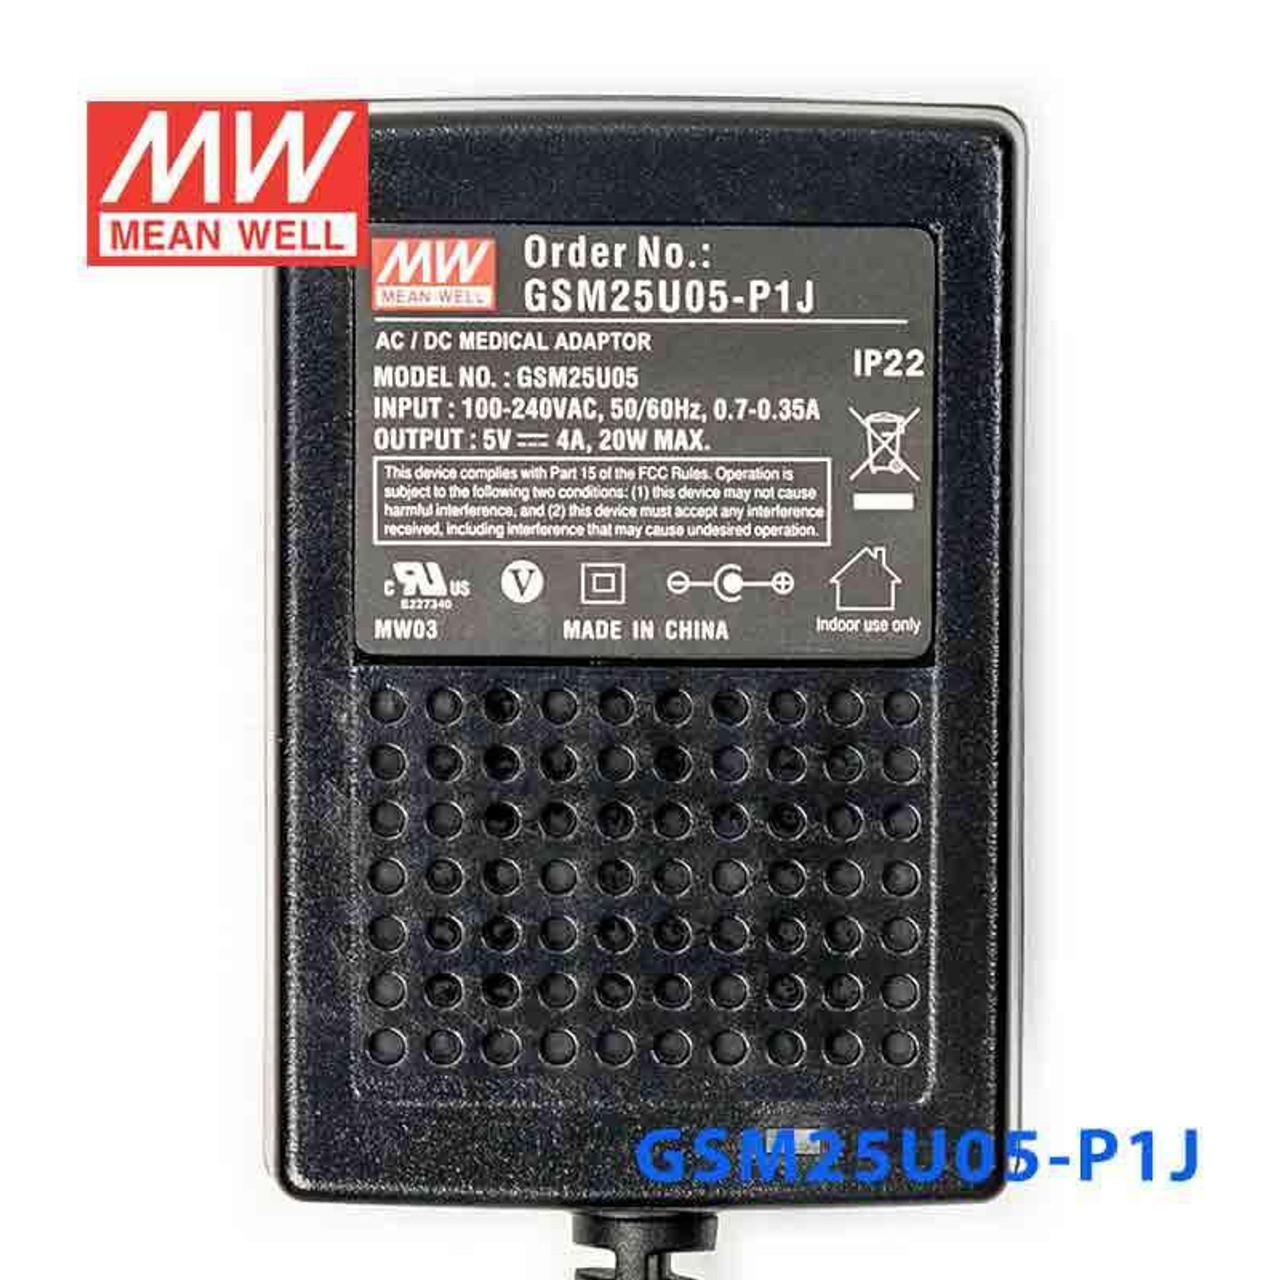 Wall Mount AC Adapters 25W 15V 1.66A Medical USA plug, GSM25U15-P1J Pack of 2